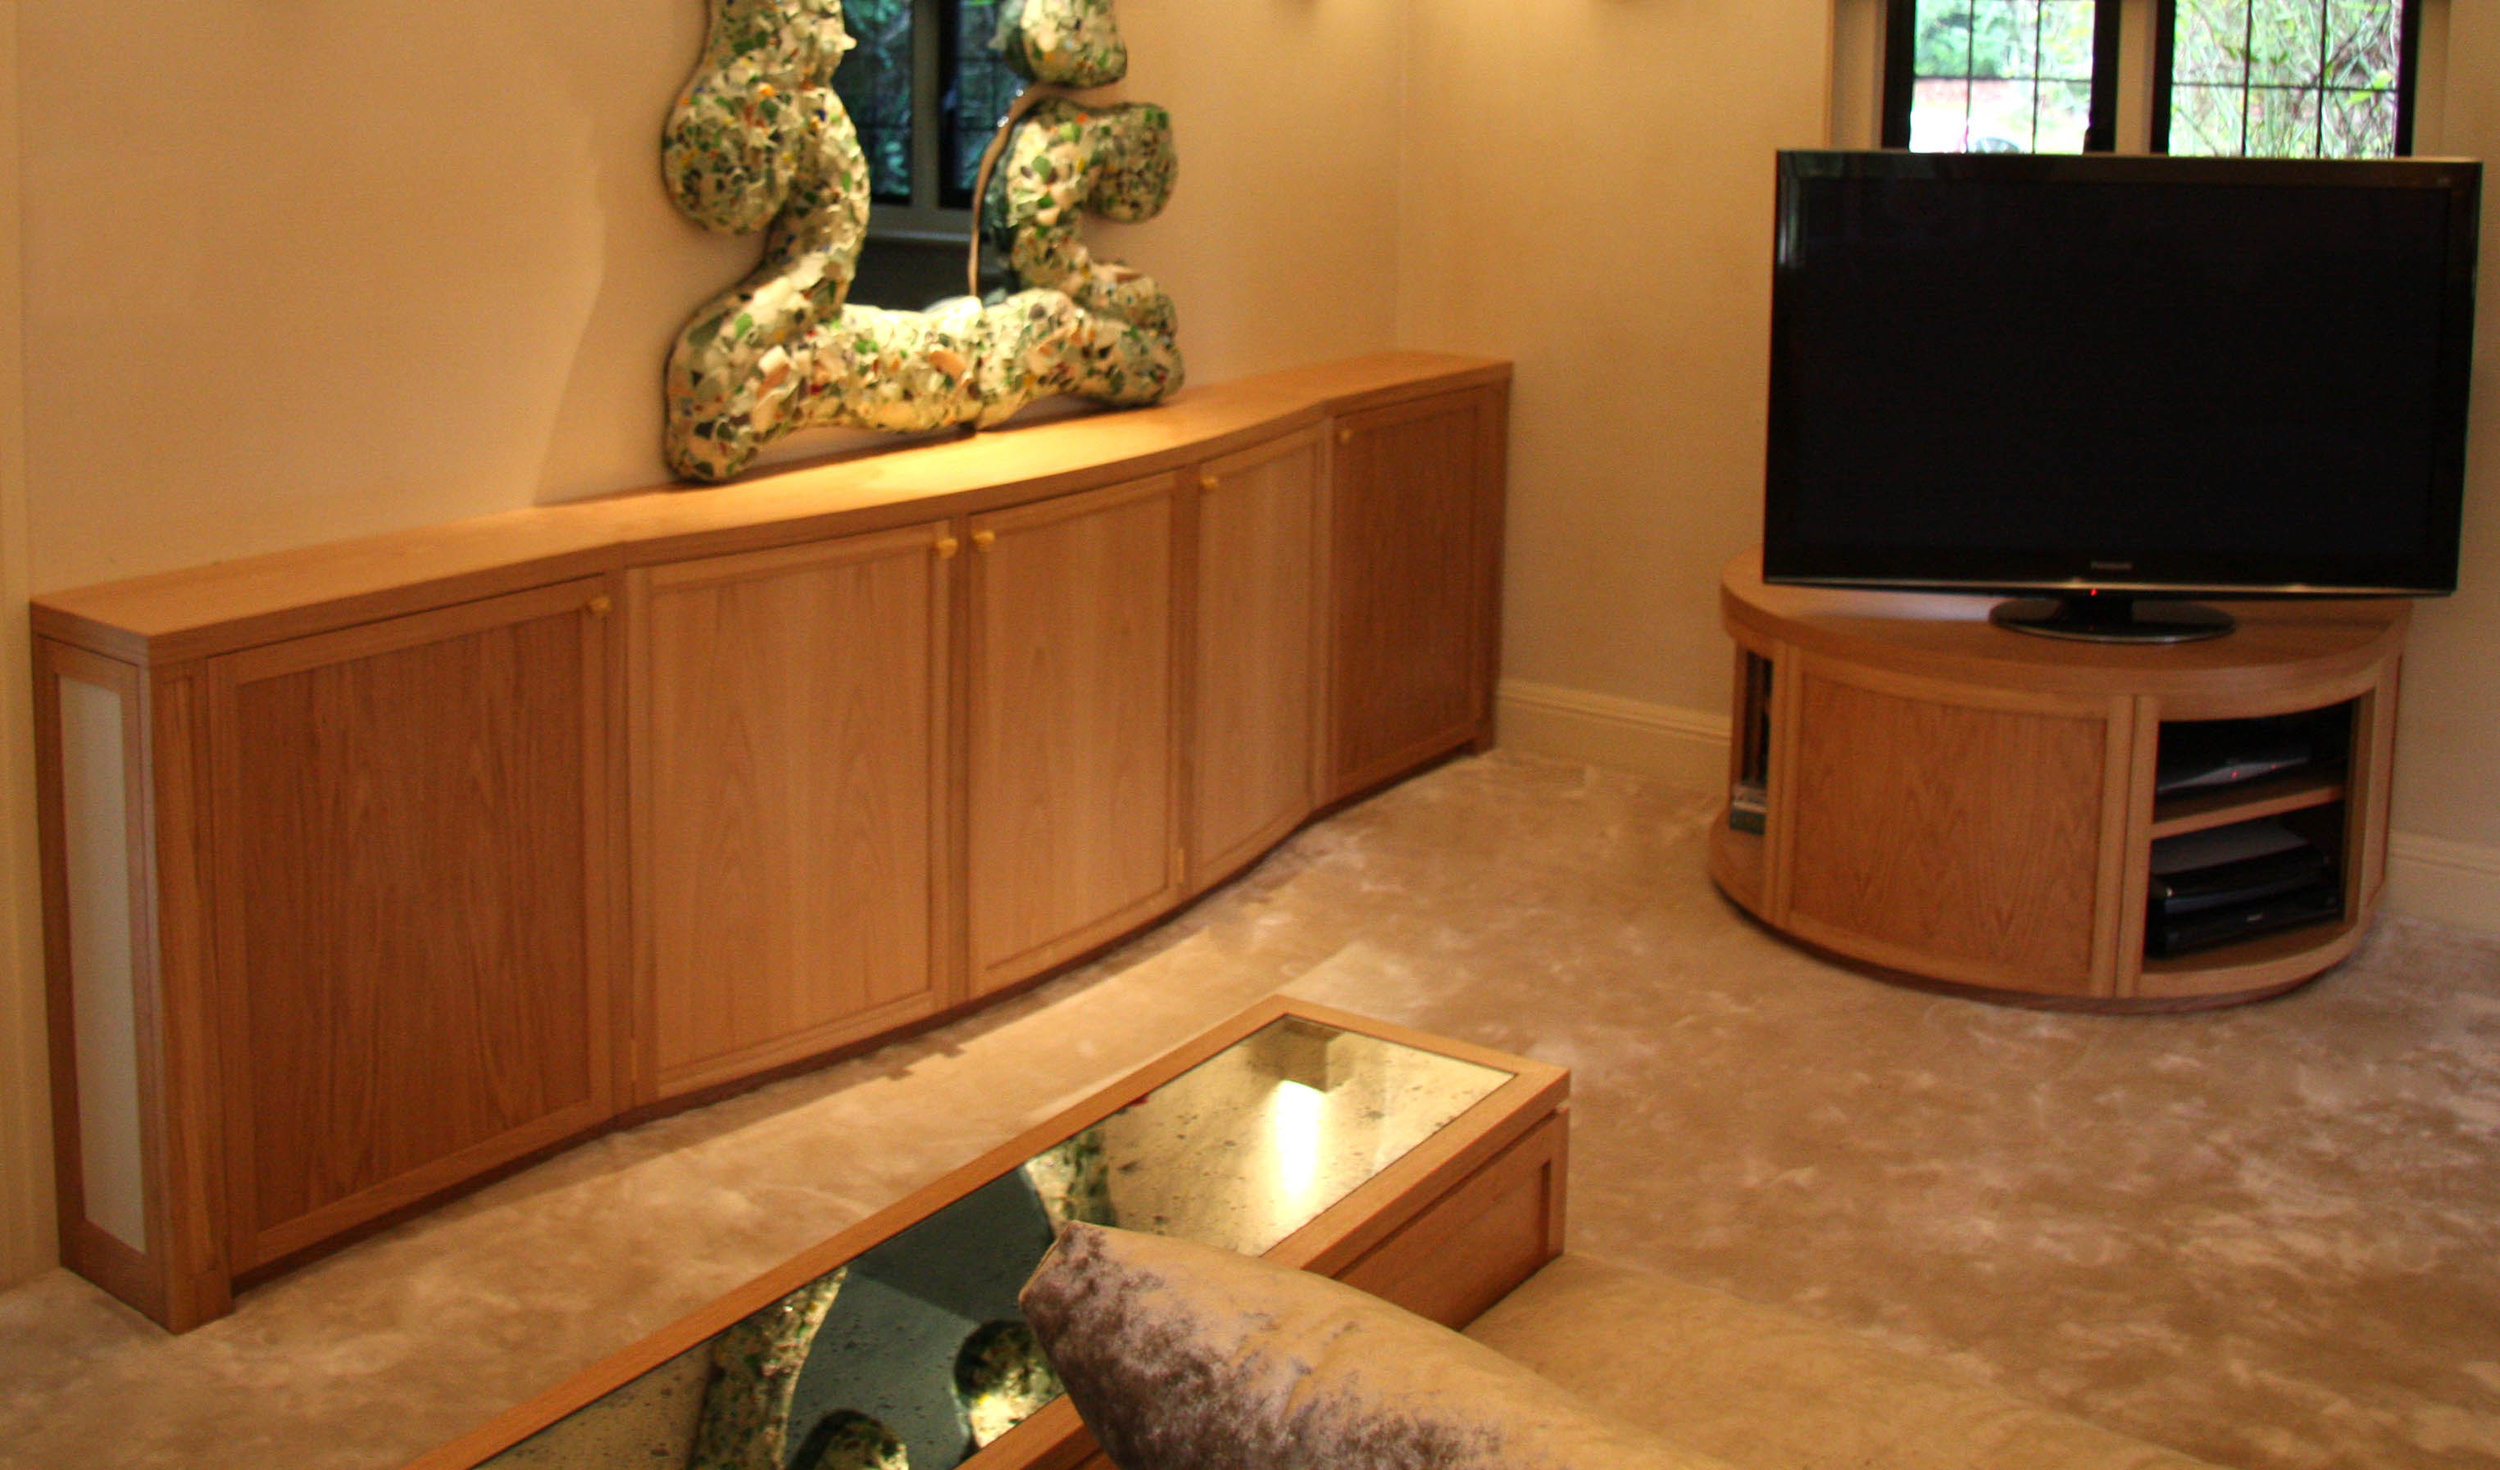 Sussex Arts and crafts house interior design (16).jpg